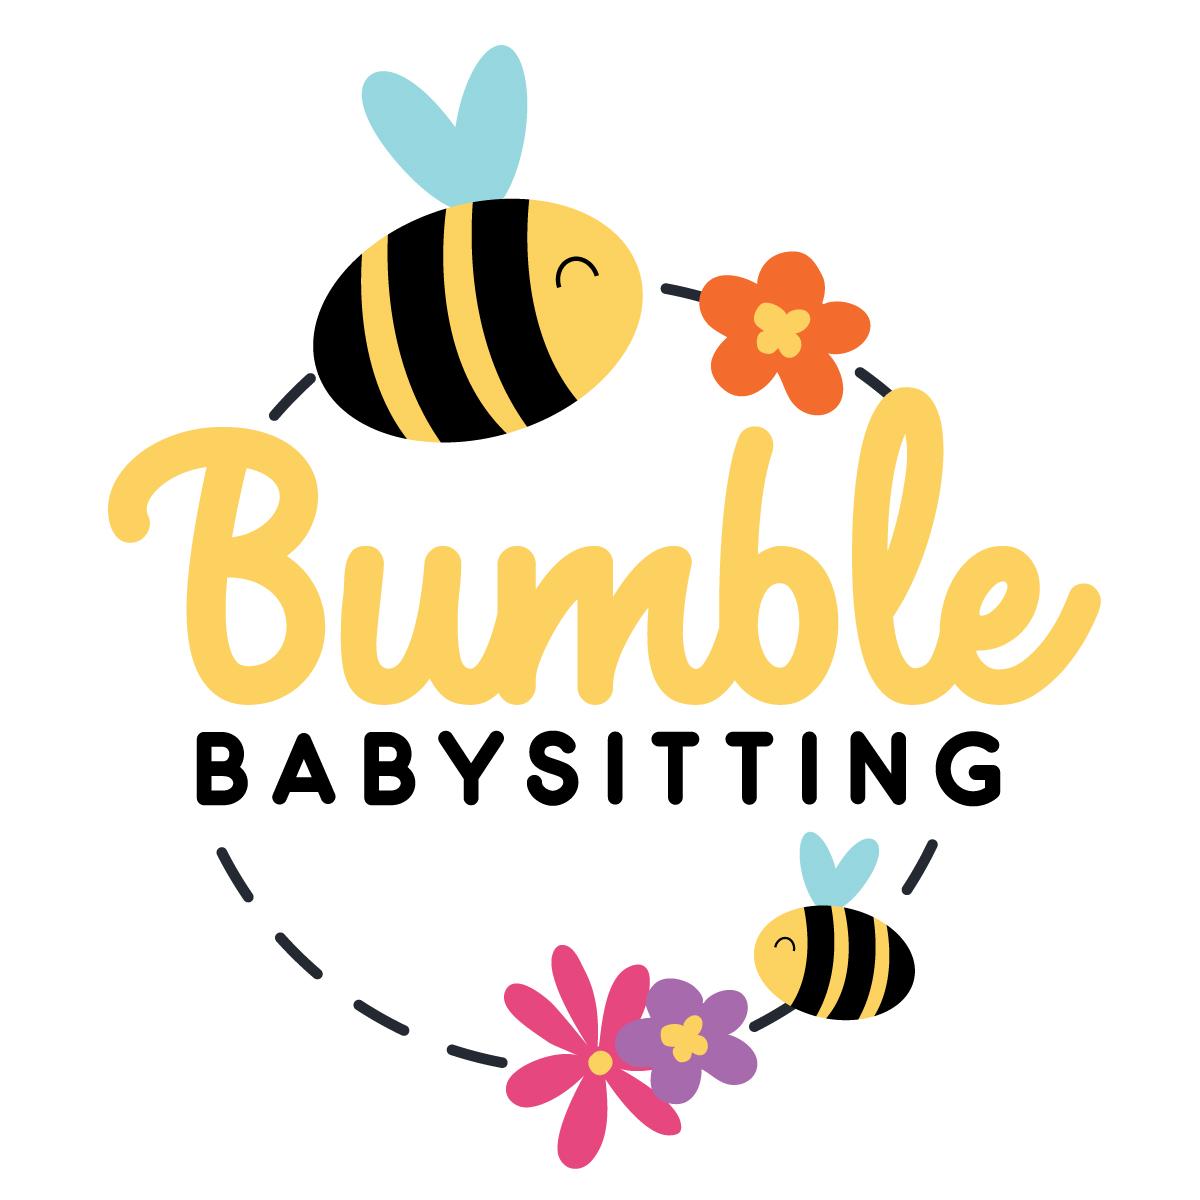 Bumble-babysitting Logo Design